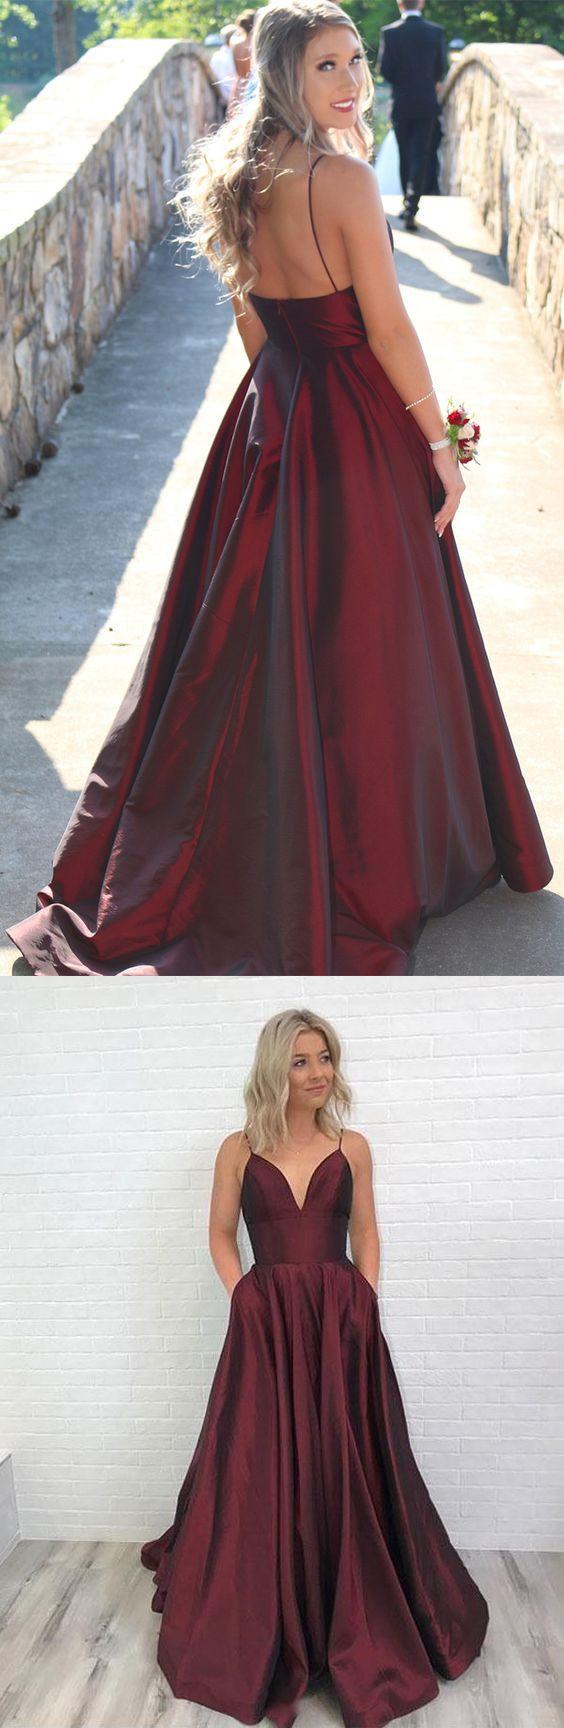 spaghetti straps burgundy long homecoming dresses prom dresses formal evening